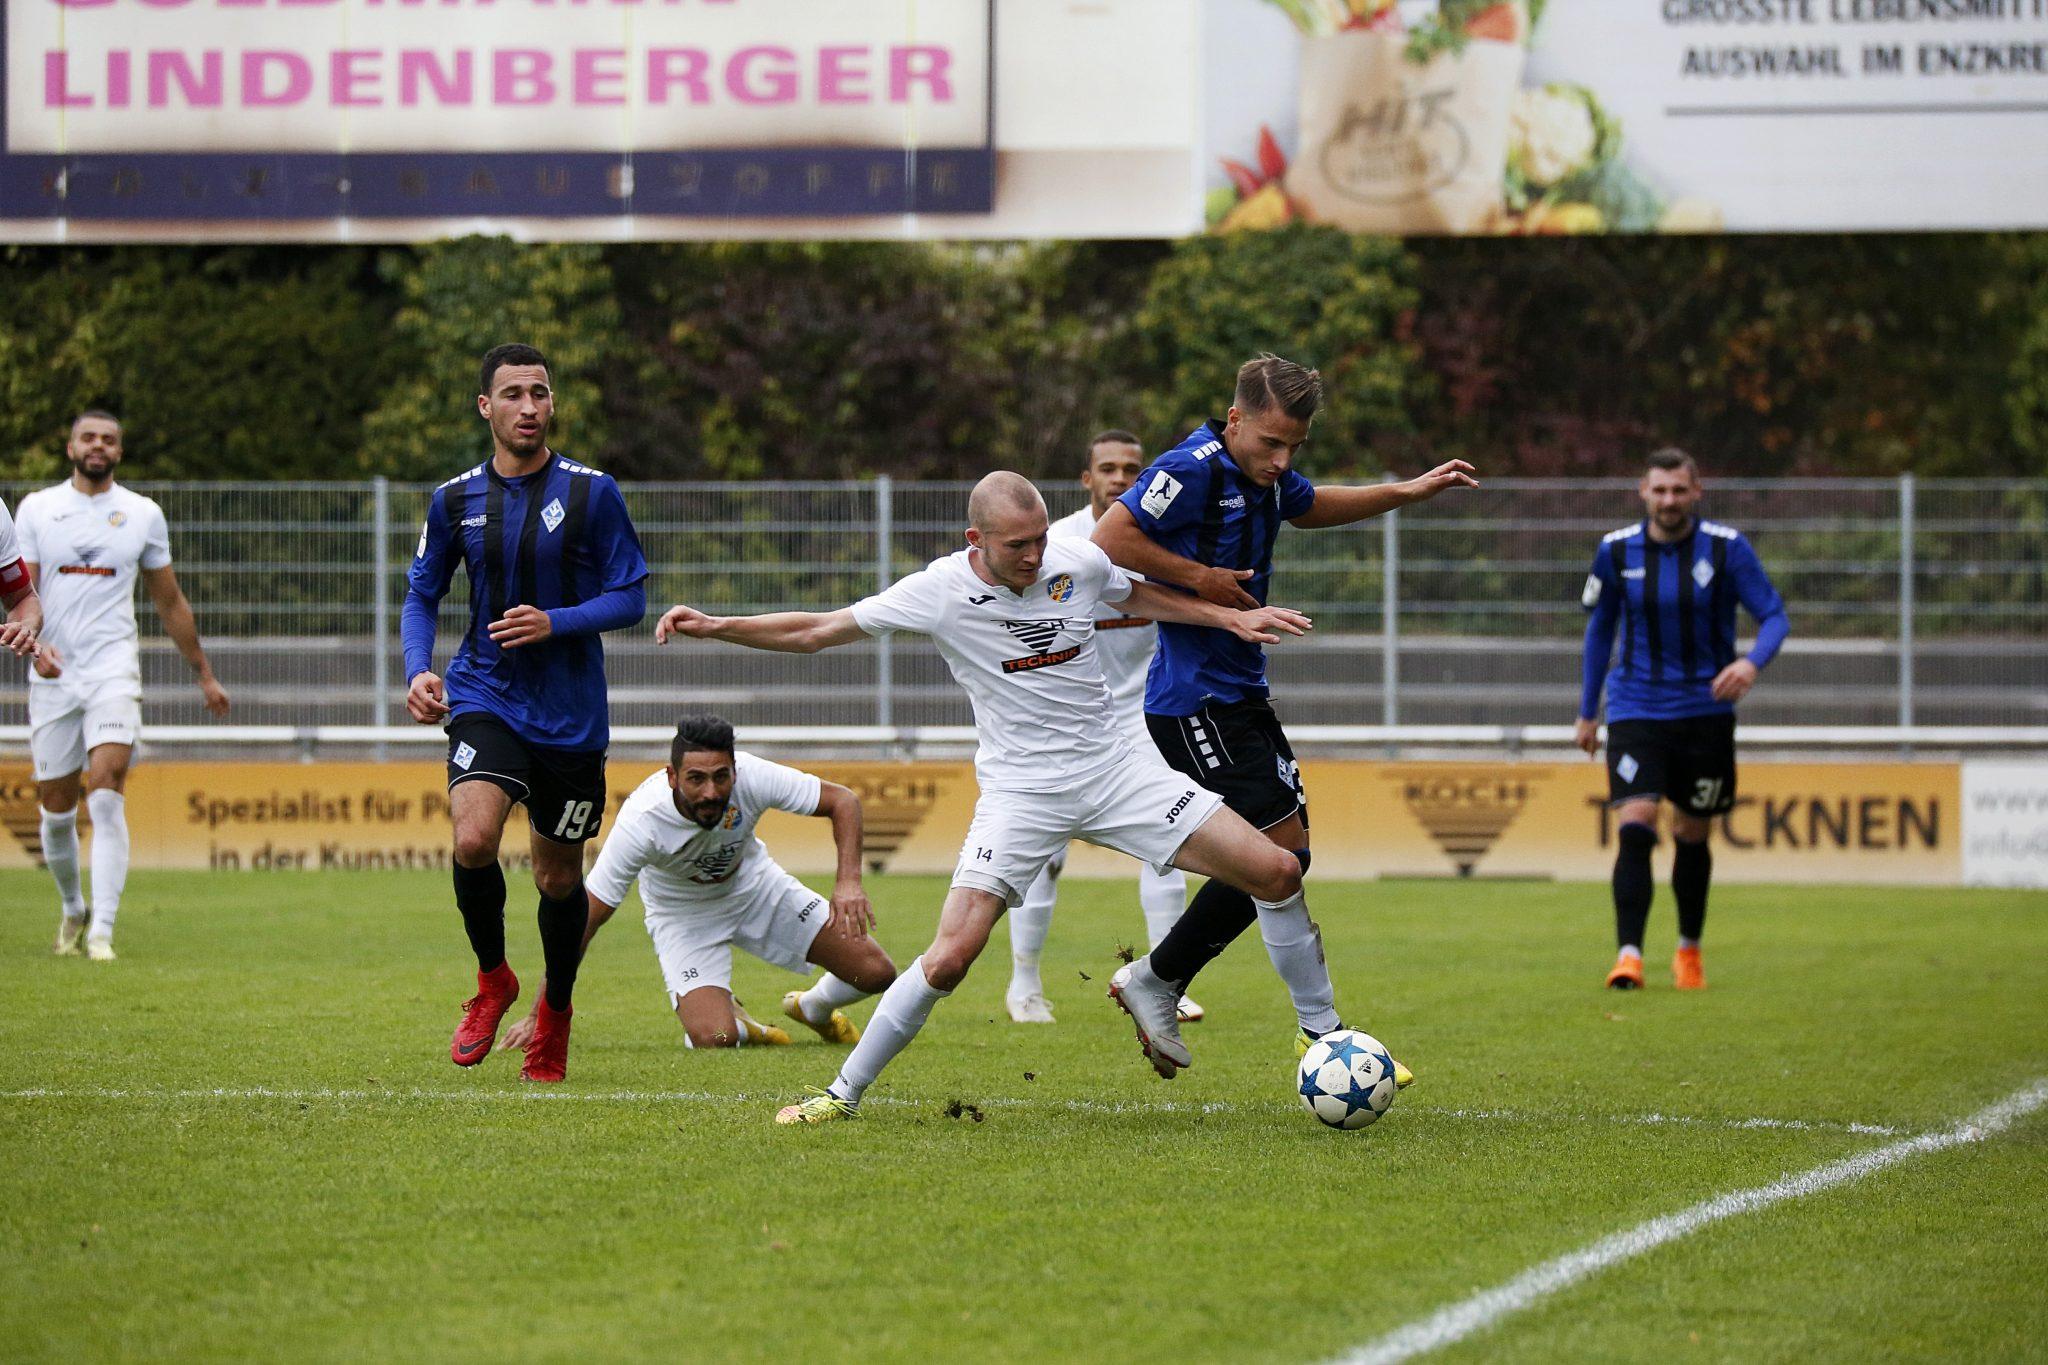 CfR unterliegt im Pokalviertelfinale knapp